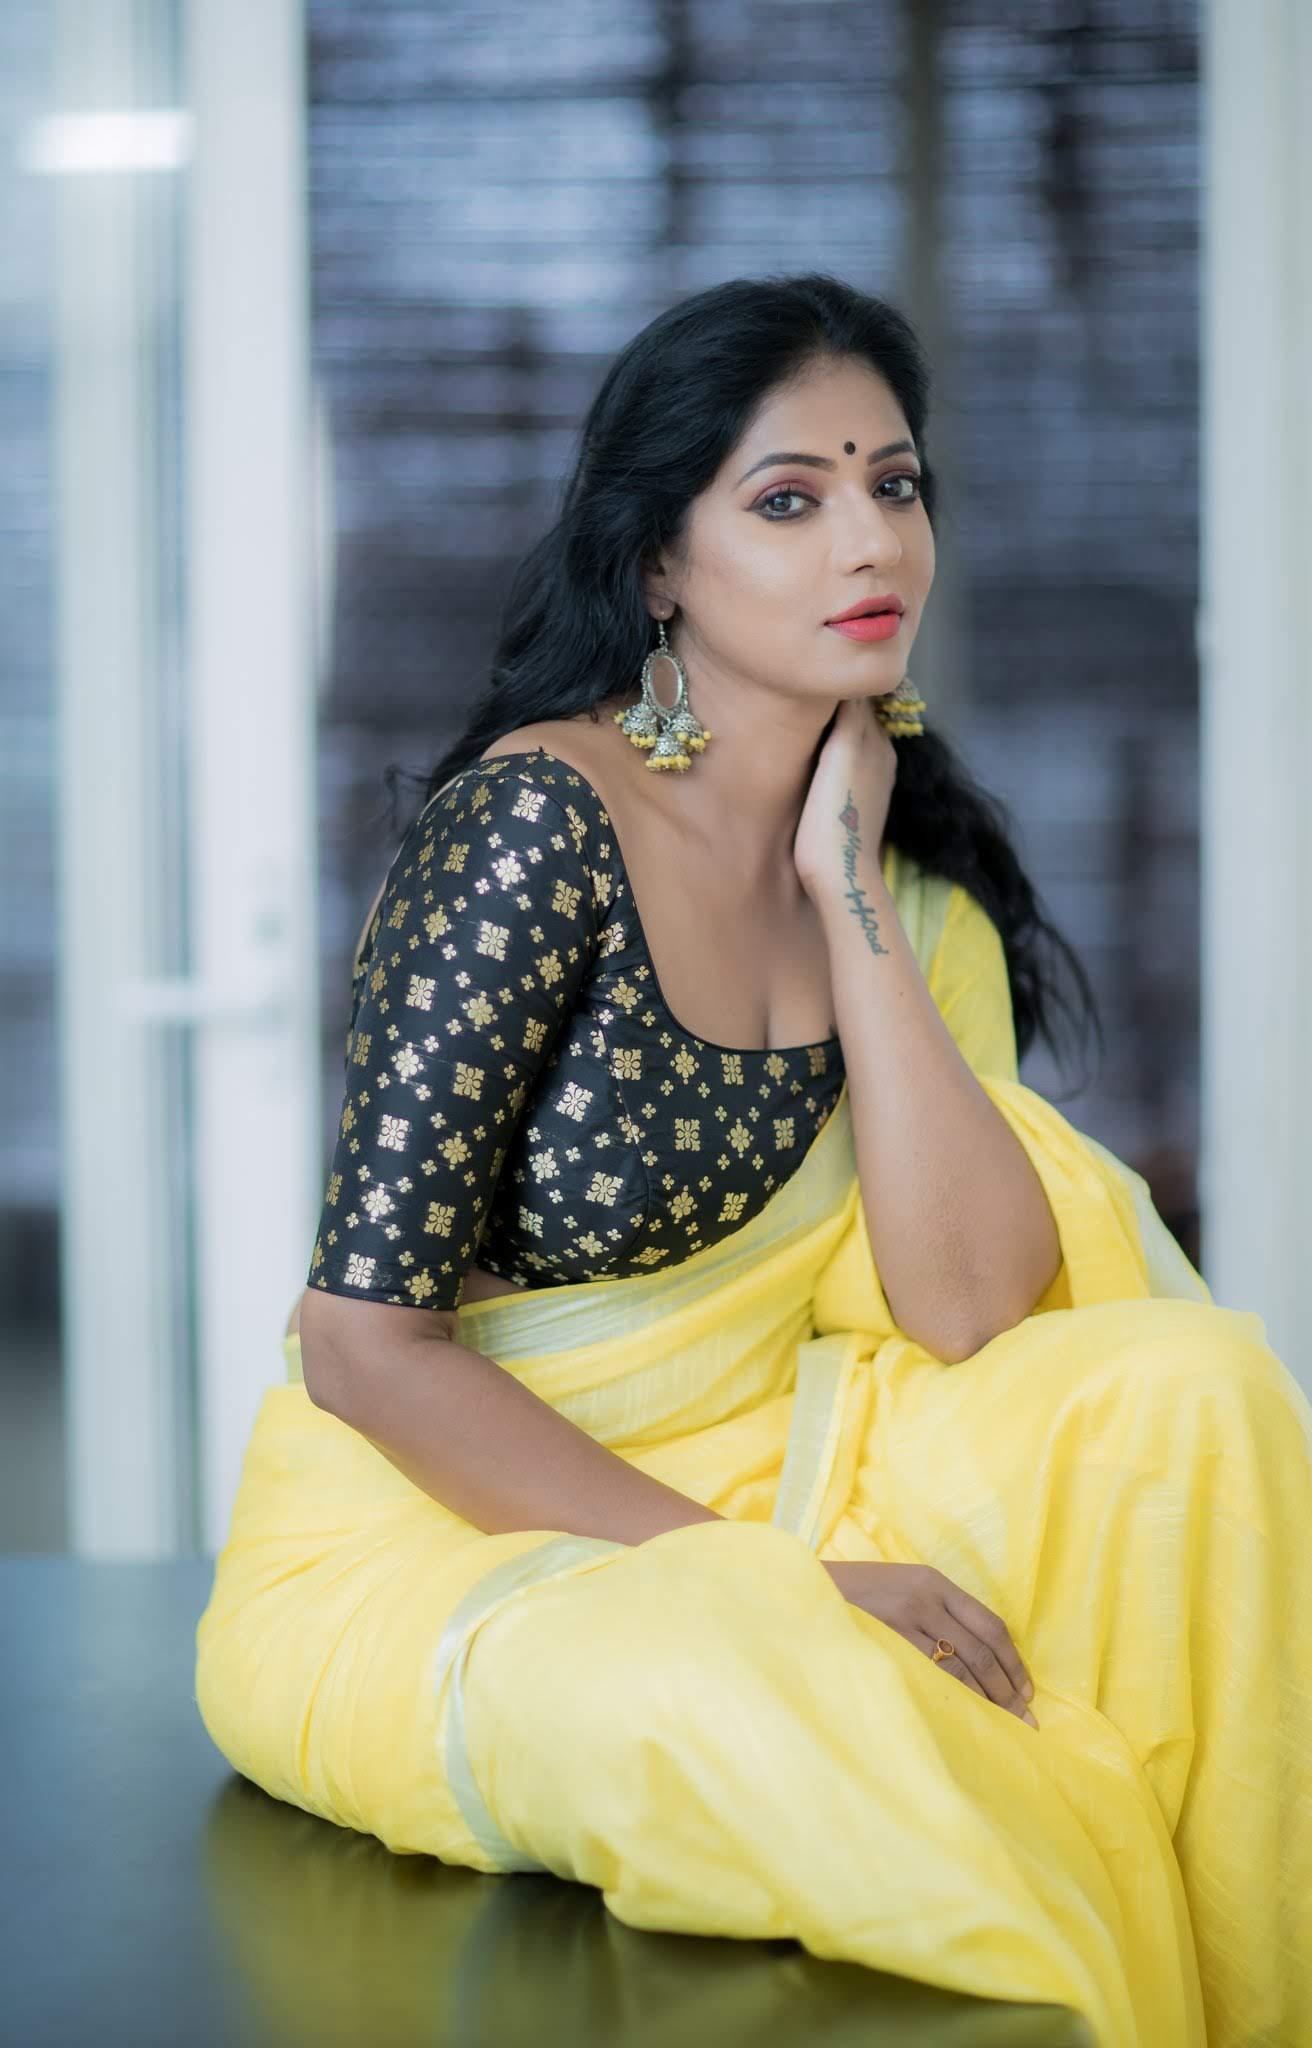 reshma_pasupu_latest_36453